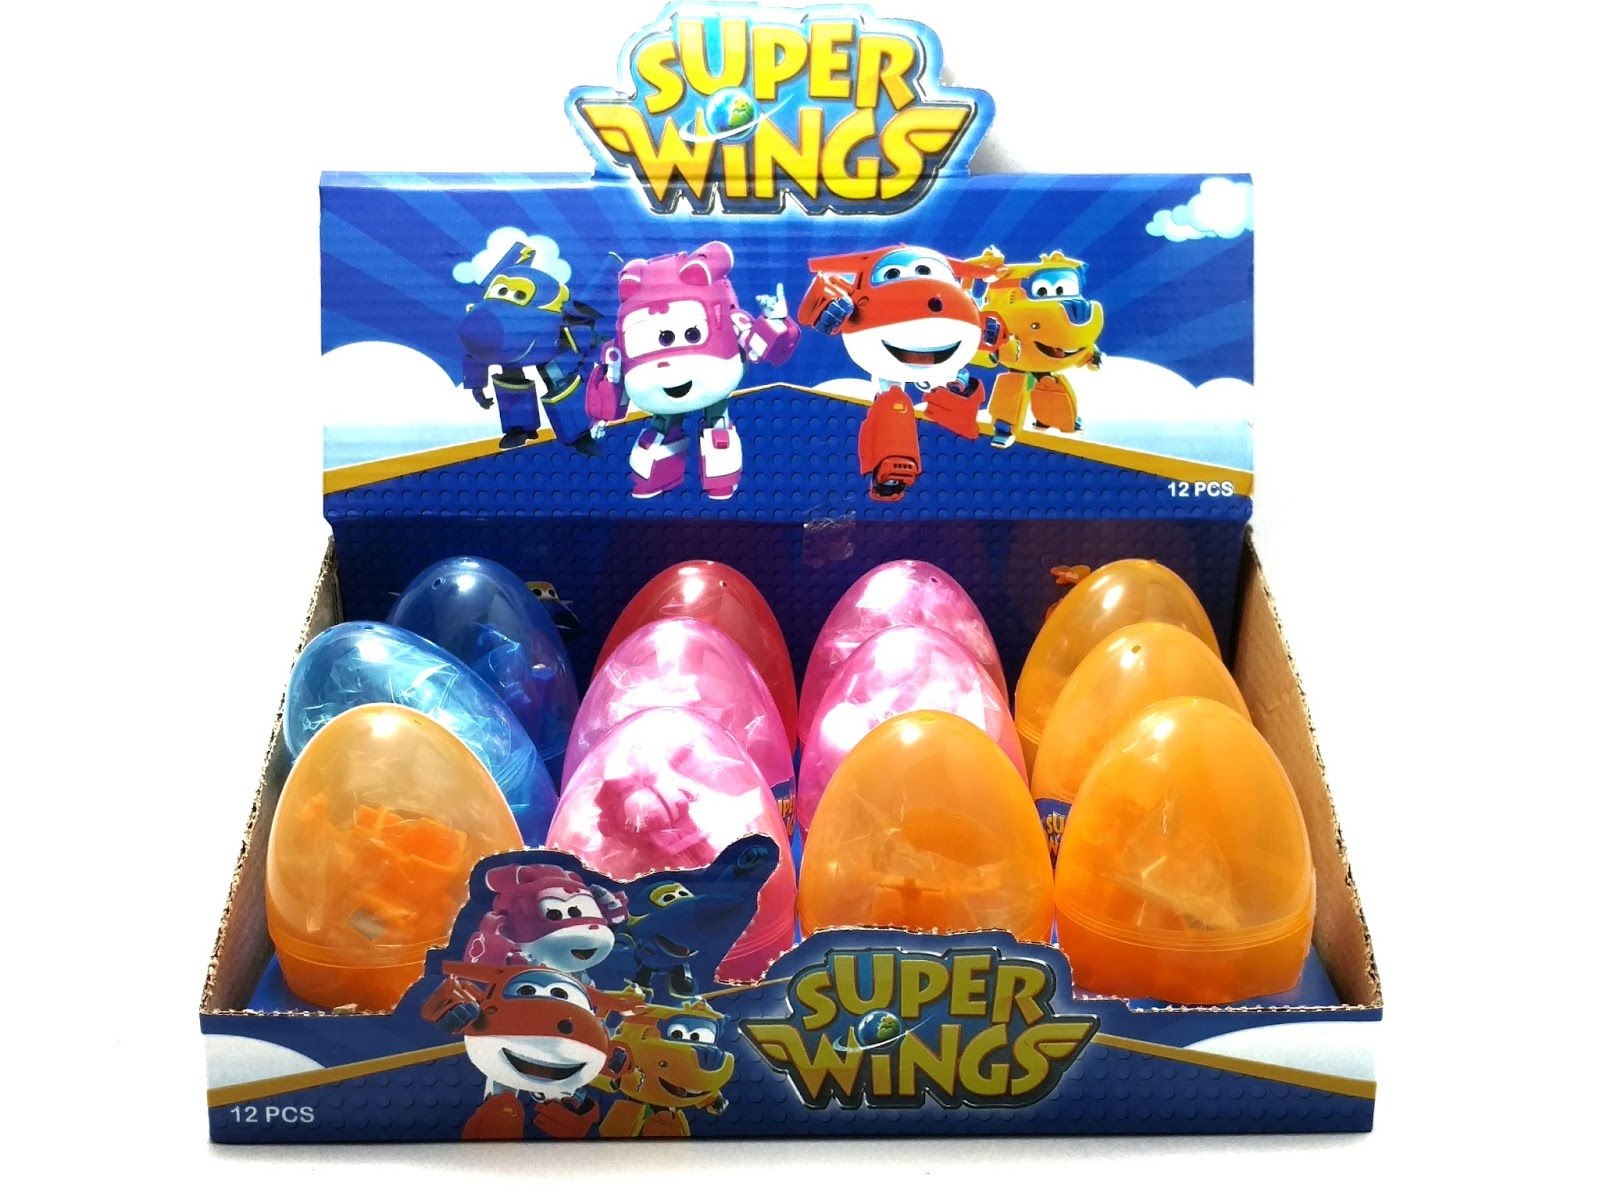 Egg Surprise Super Wings, surprise egg, egg surprise, surprising egg, super wing surprise egg